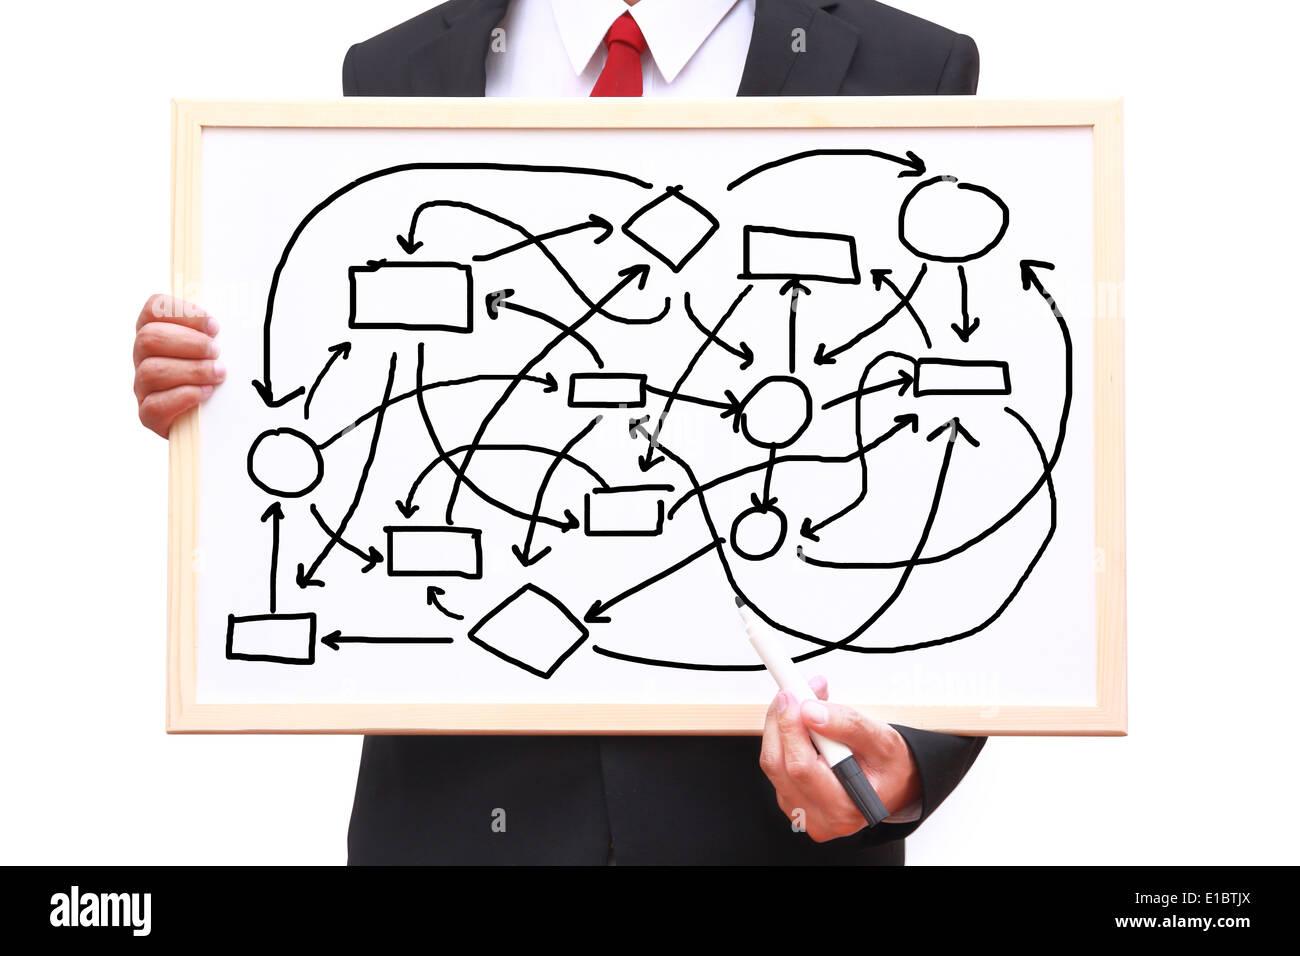 concept weak management diagram planning work flow busy chaotic concept - Stock Image